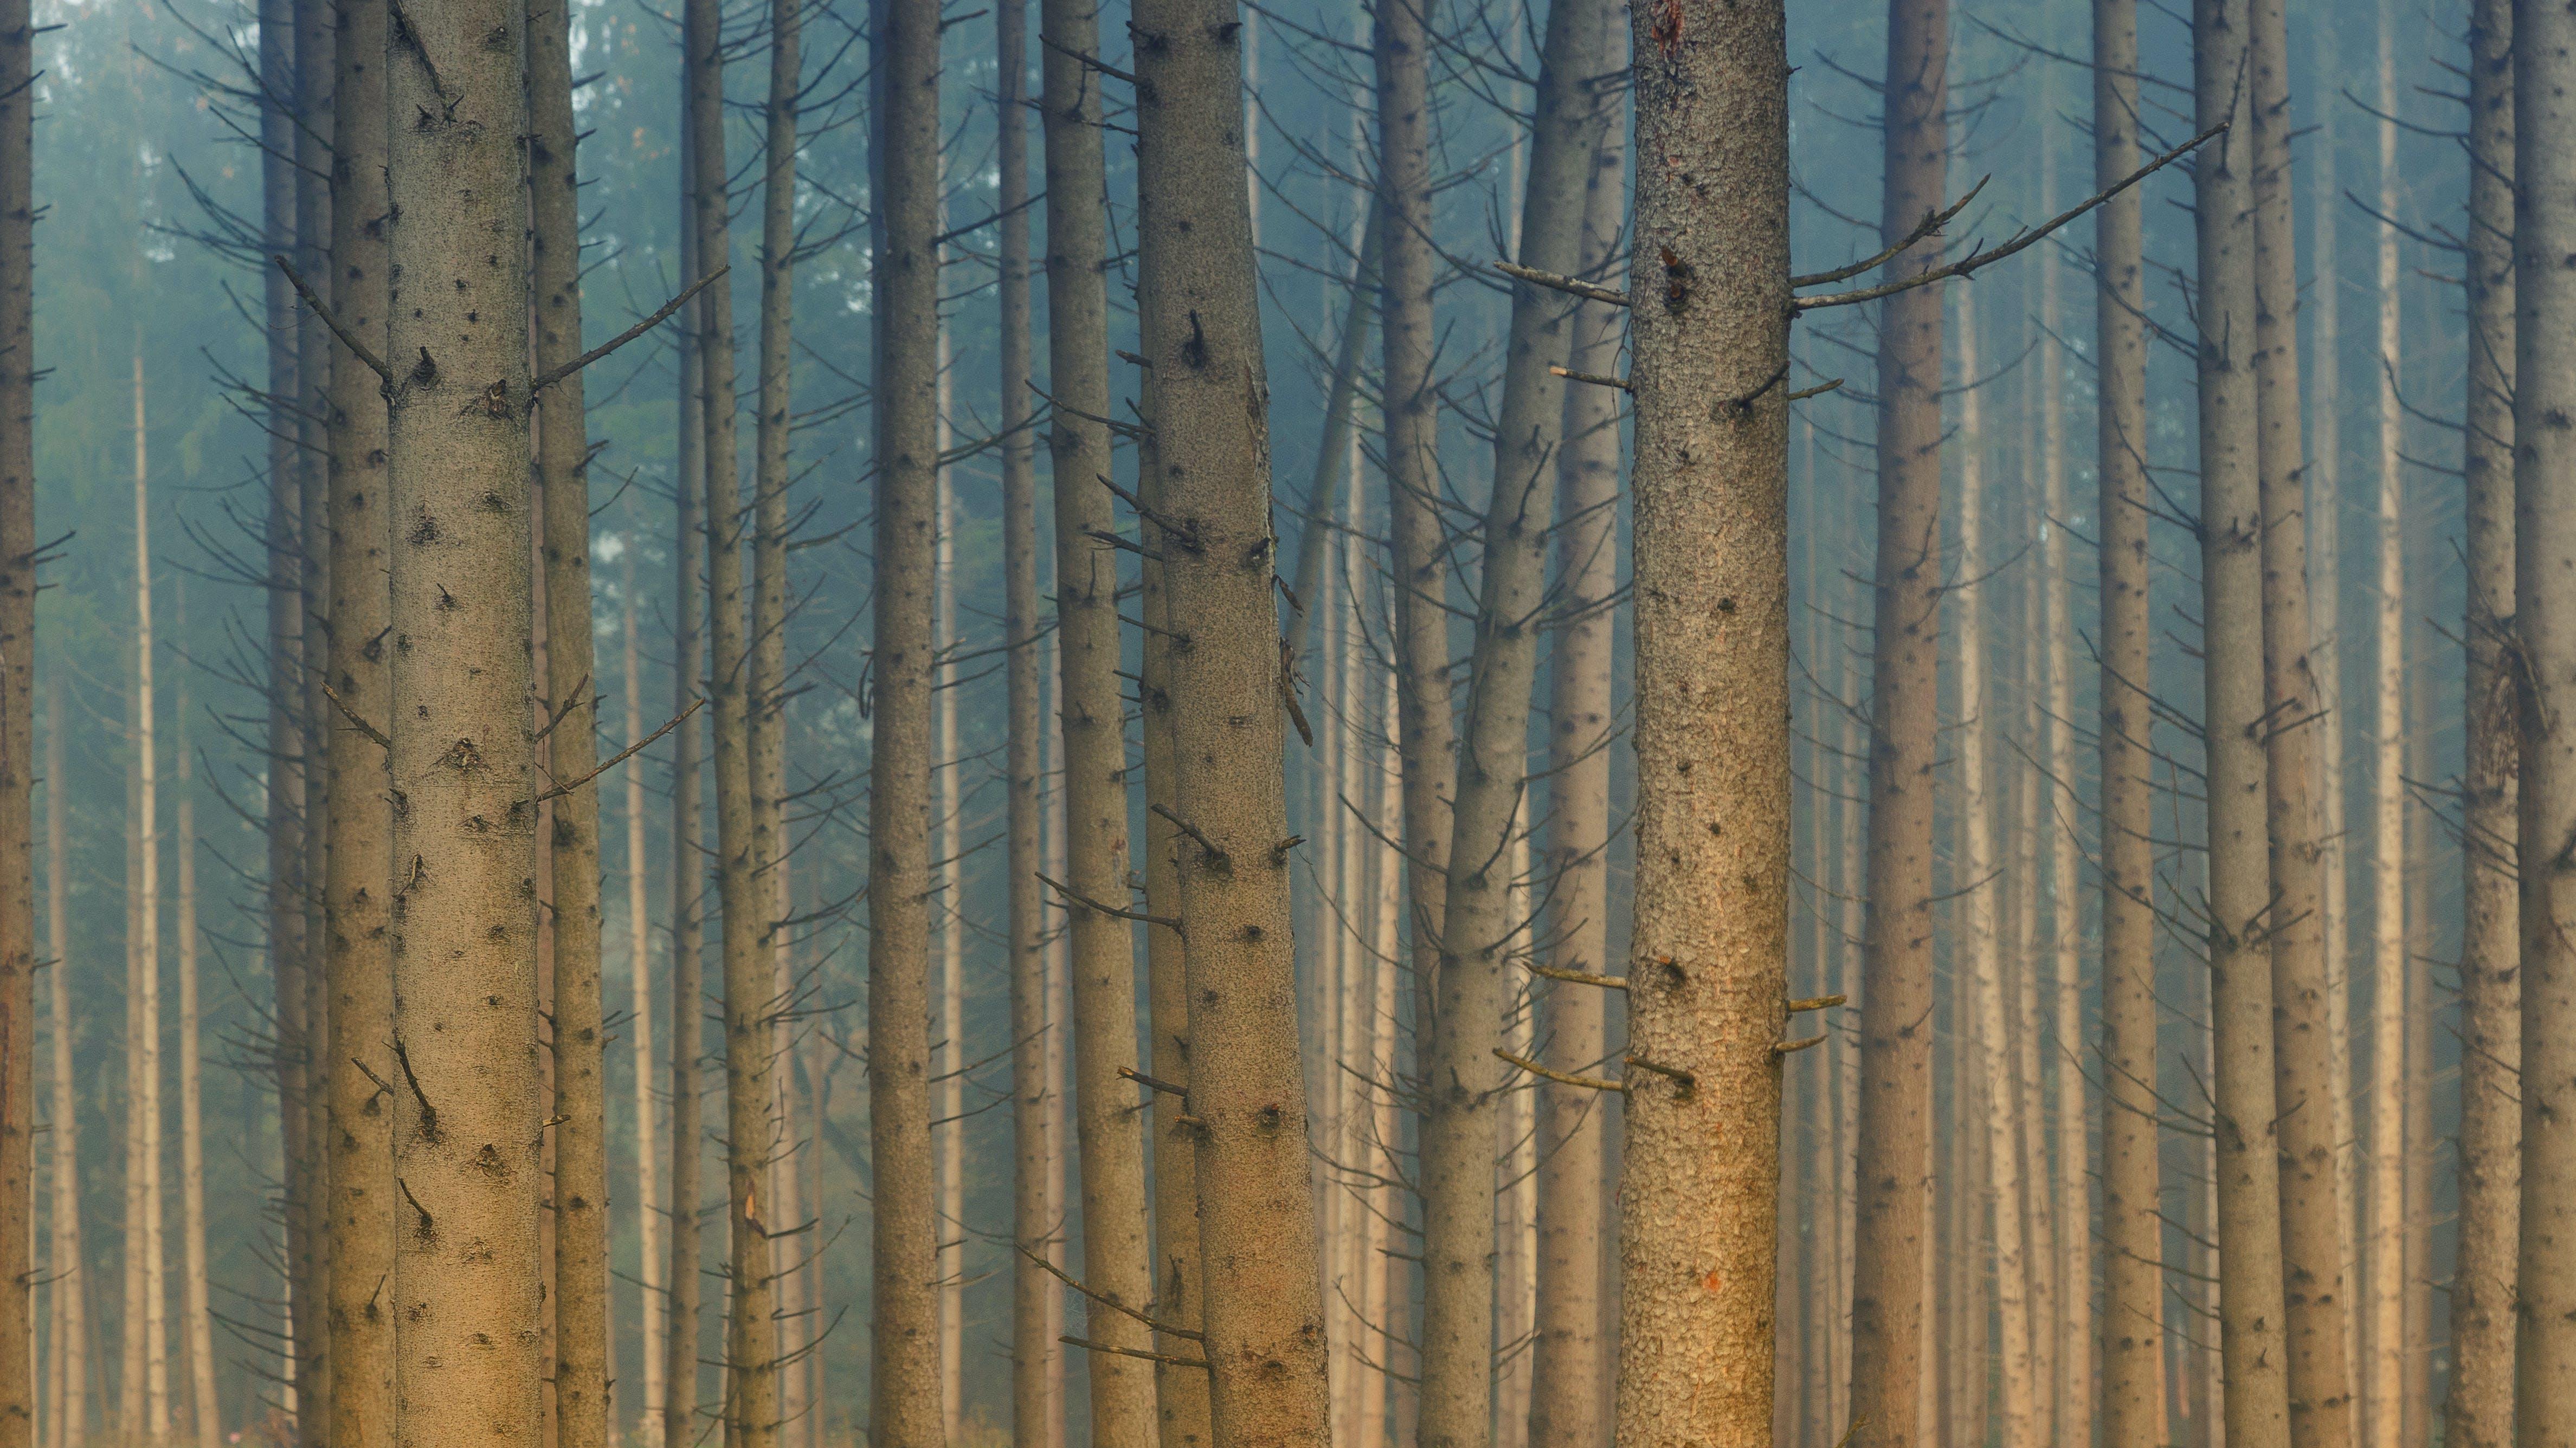 Brown Wood Trunks Illustration